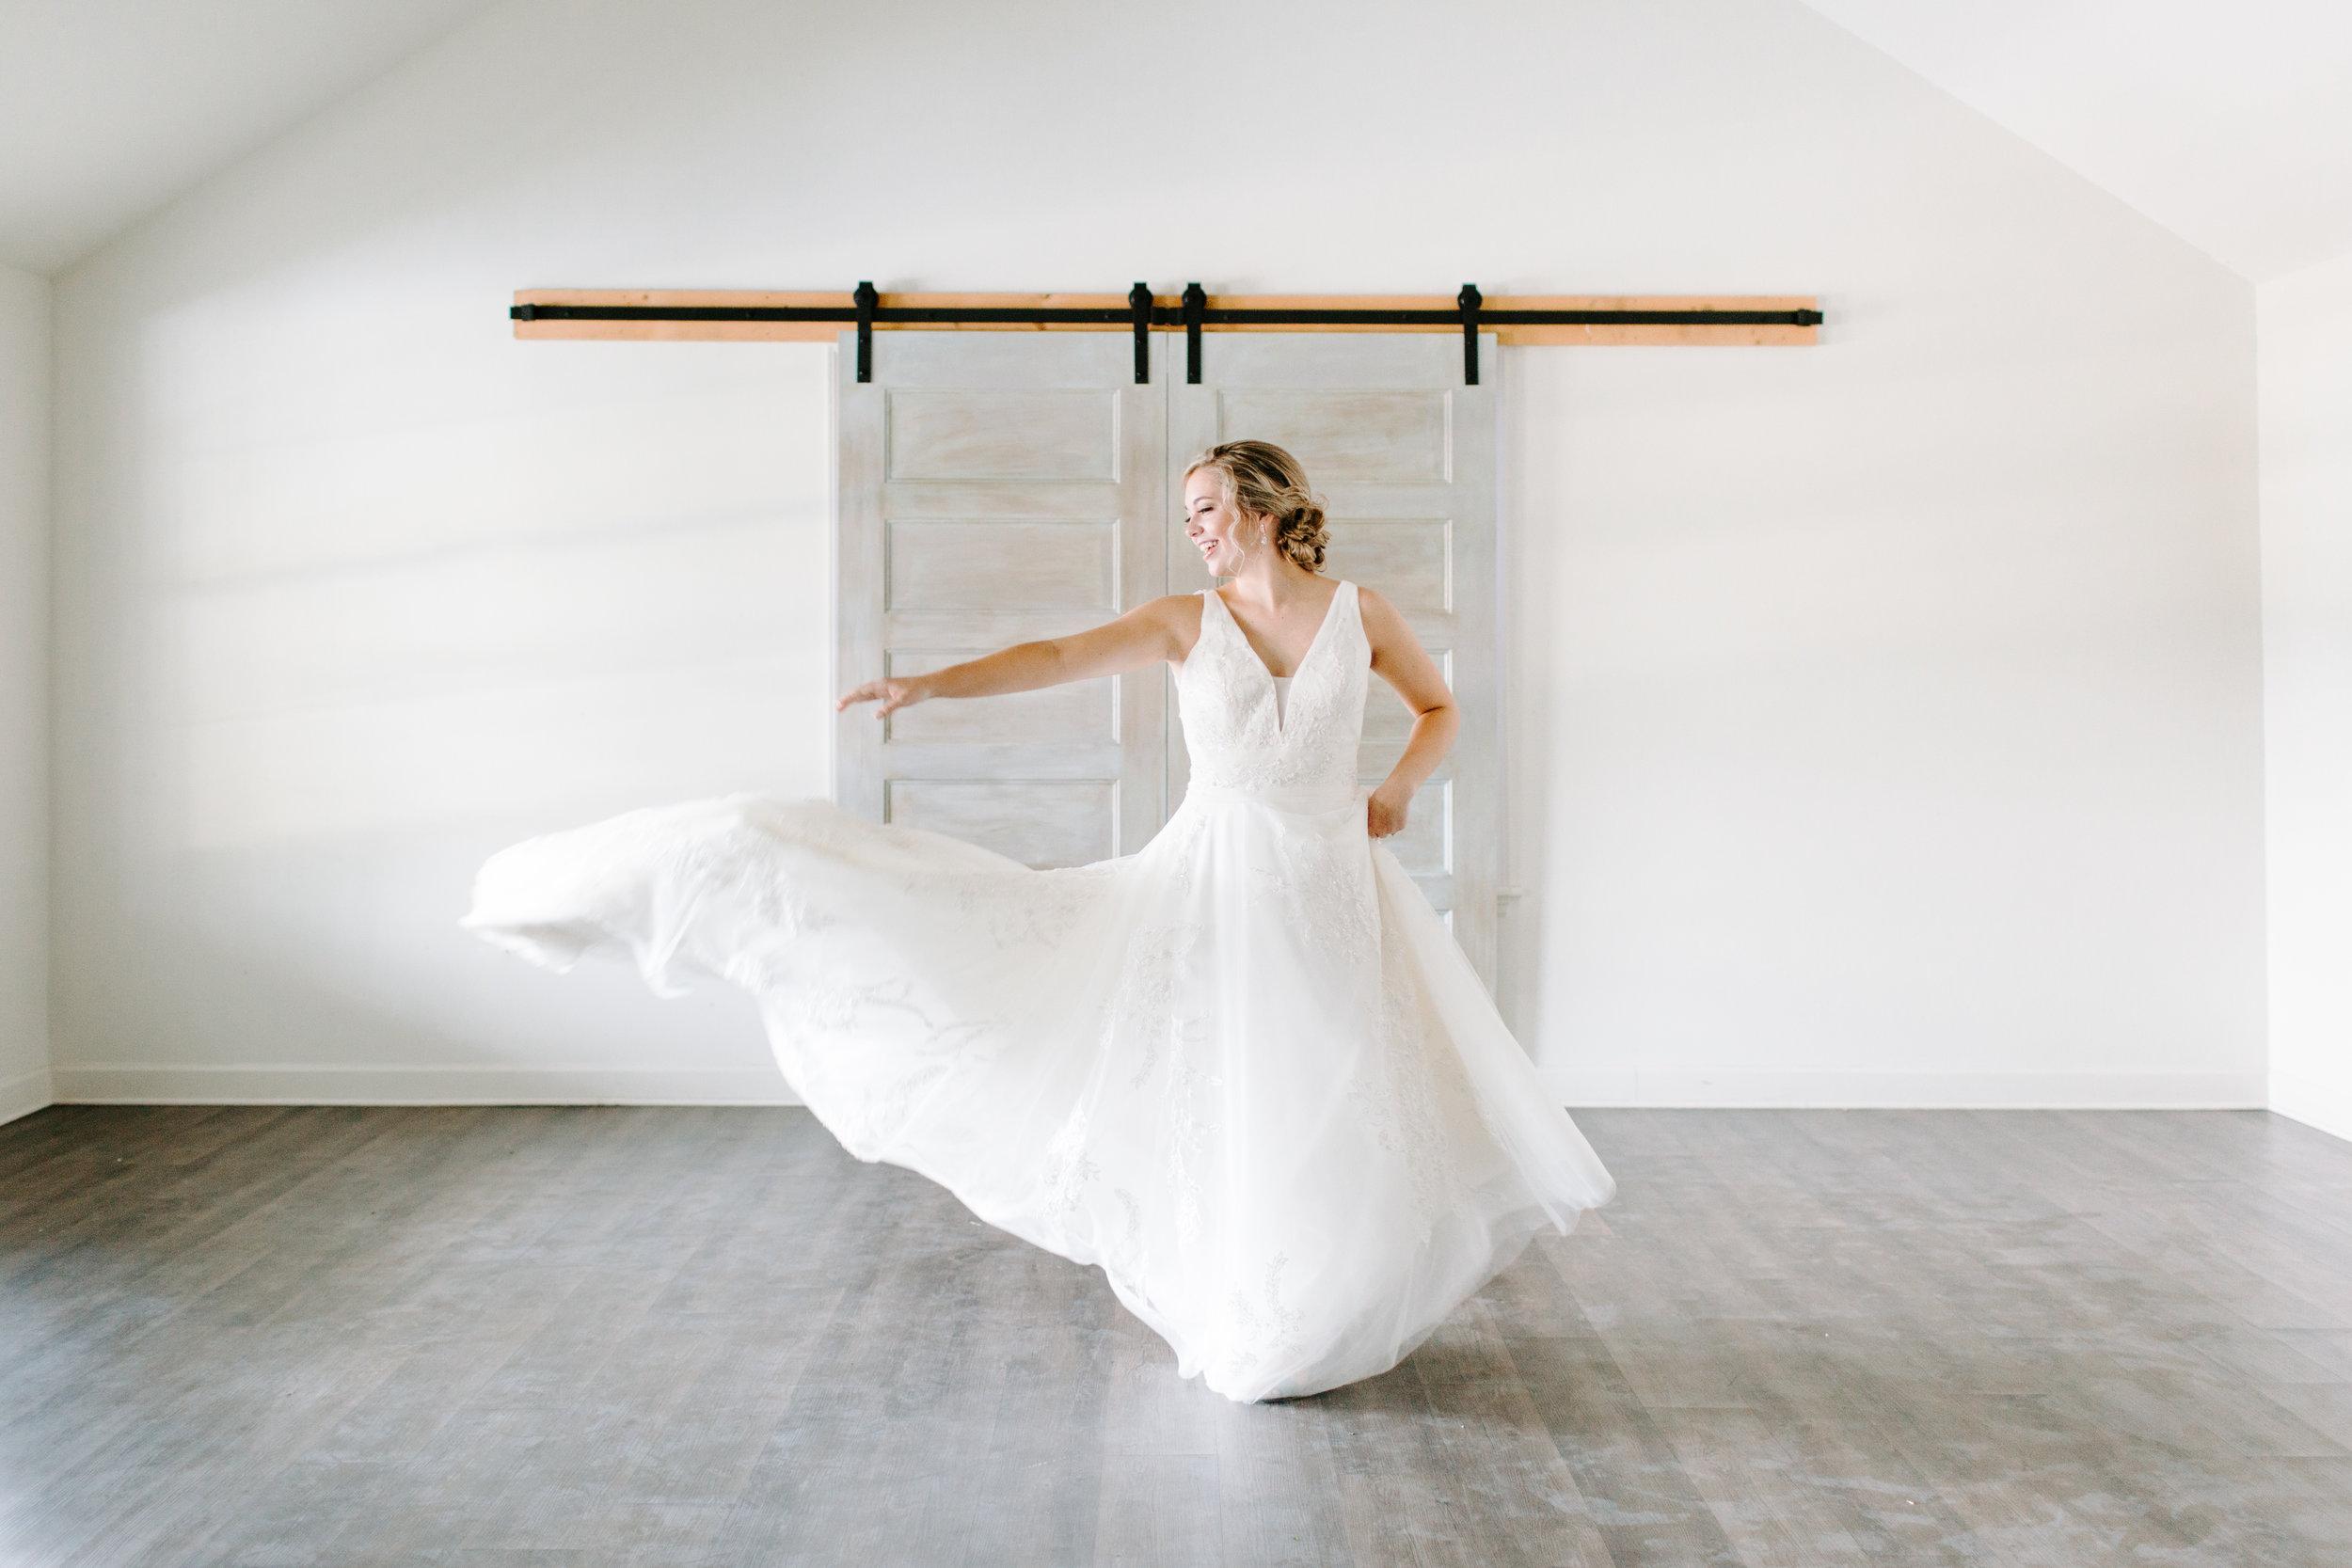 knoxville-wedding-photographer-179.JPG